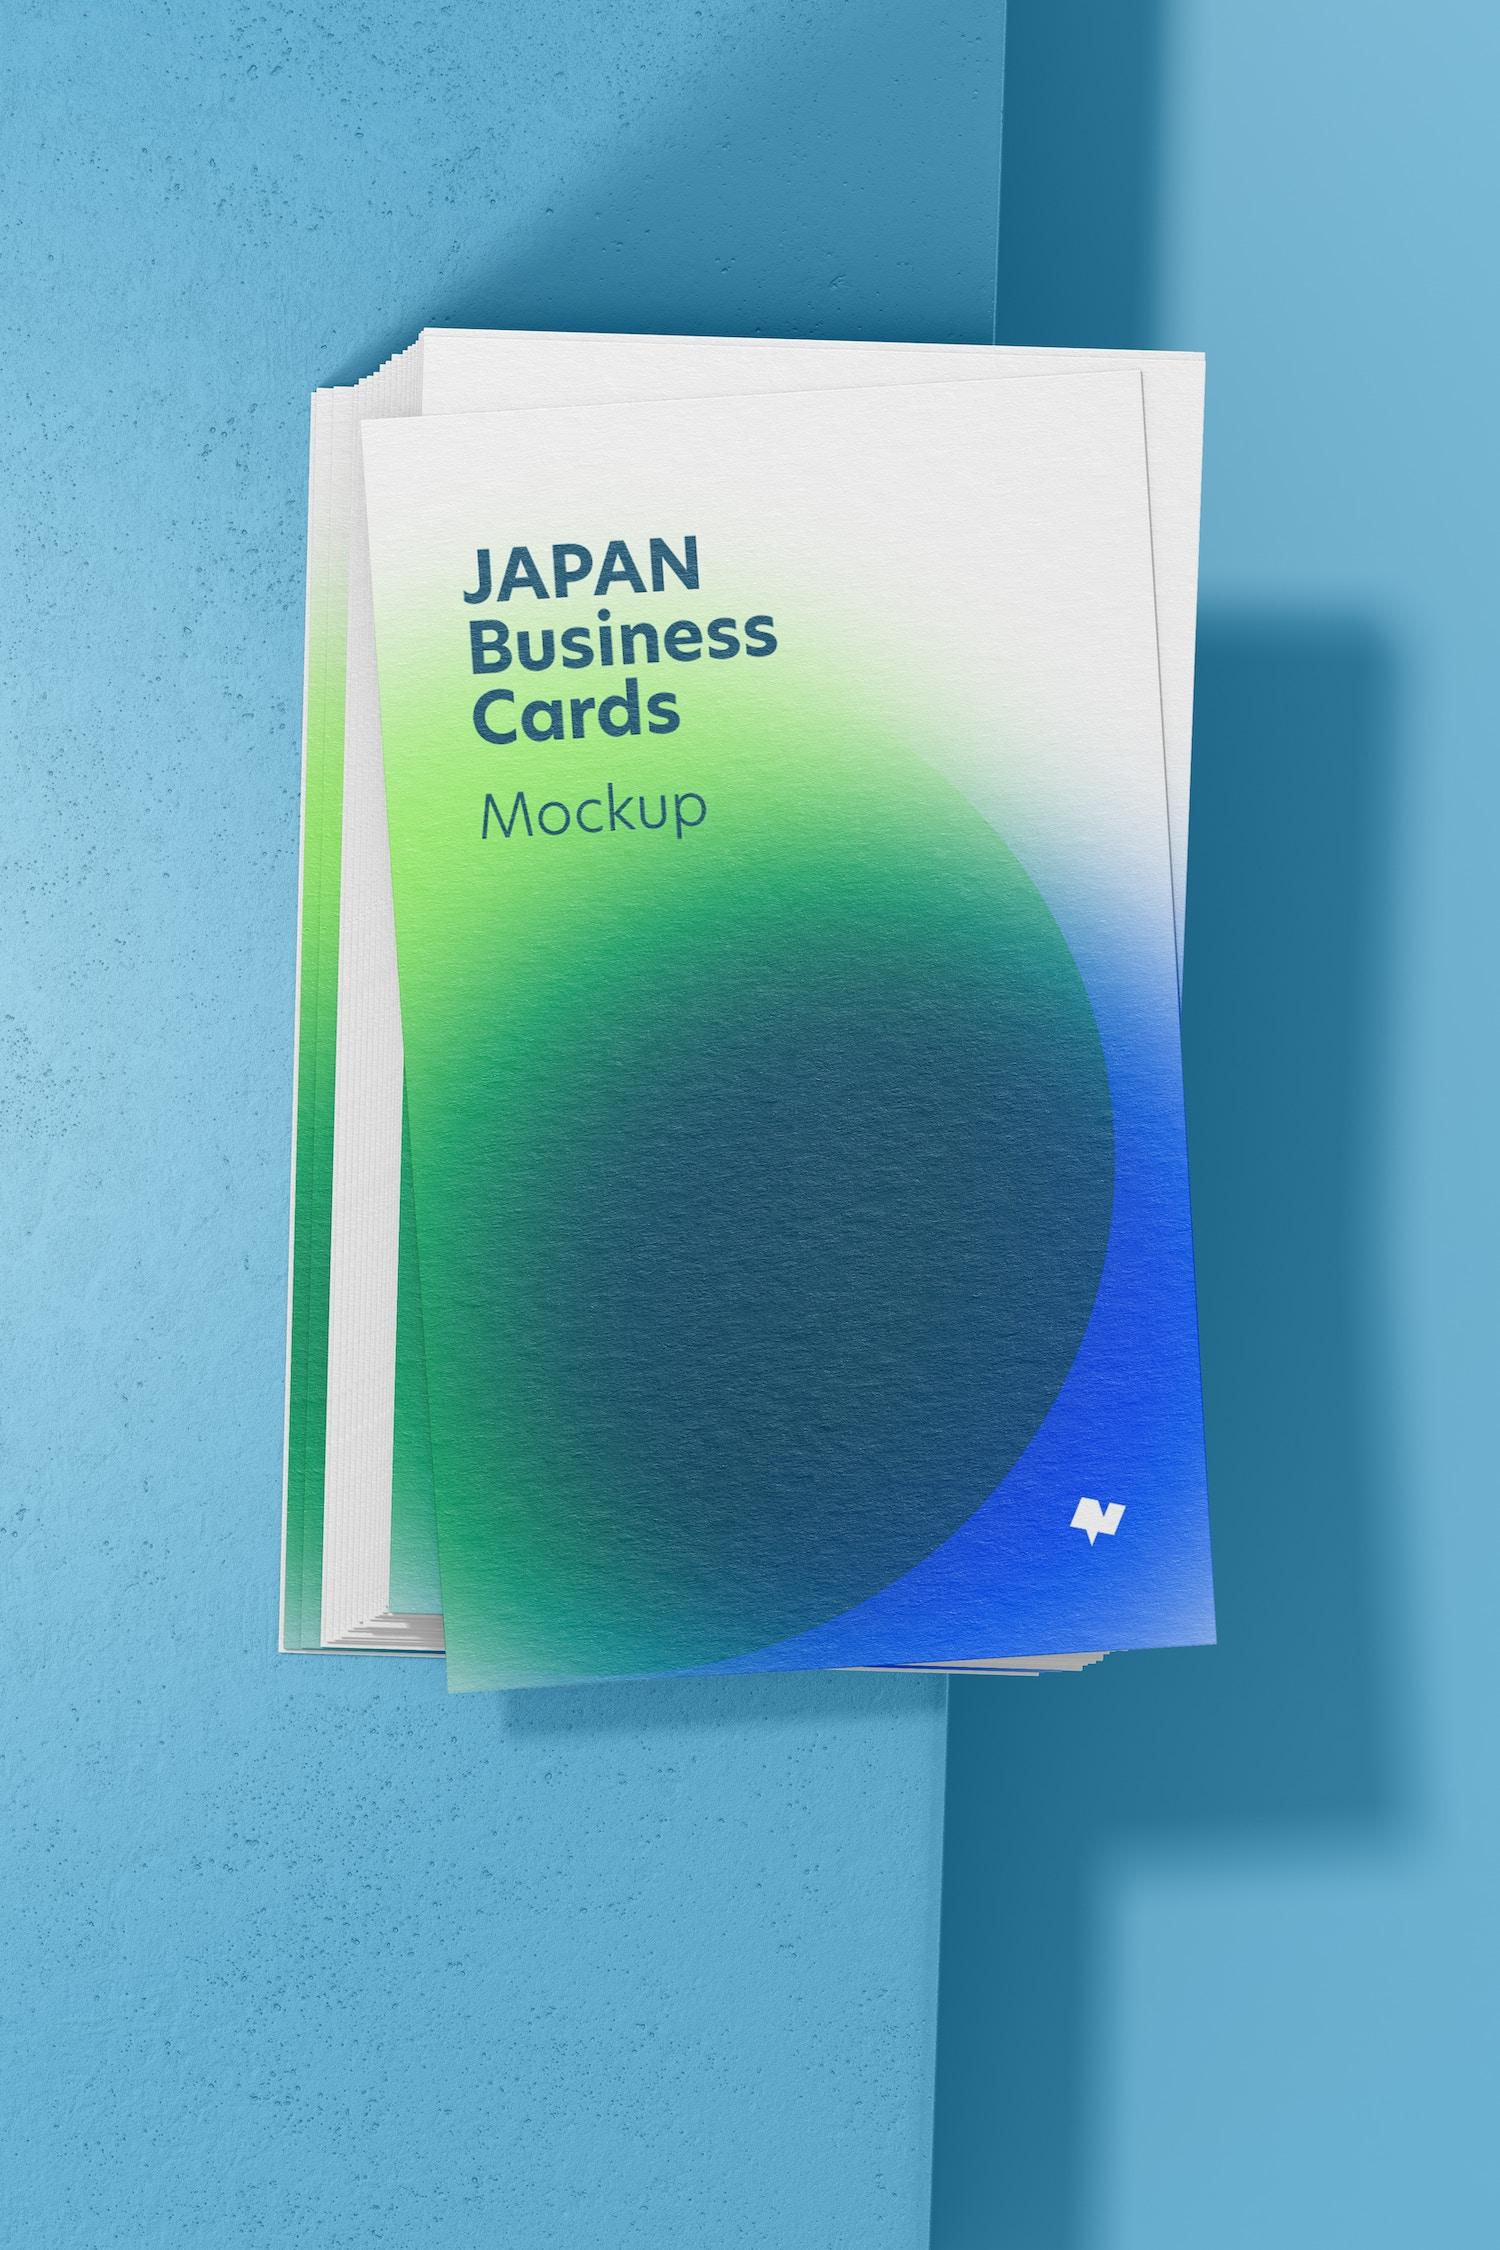 Japan Portrait Business Cards Mockup, Top View